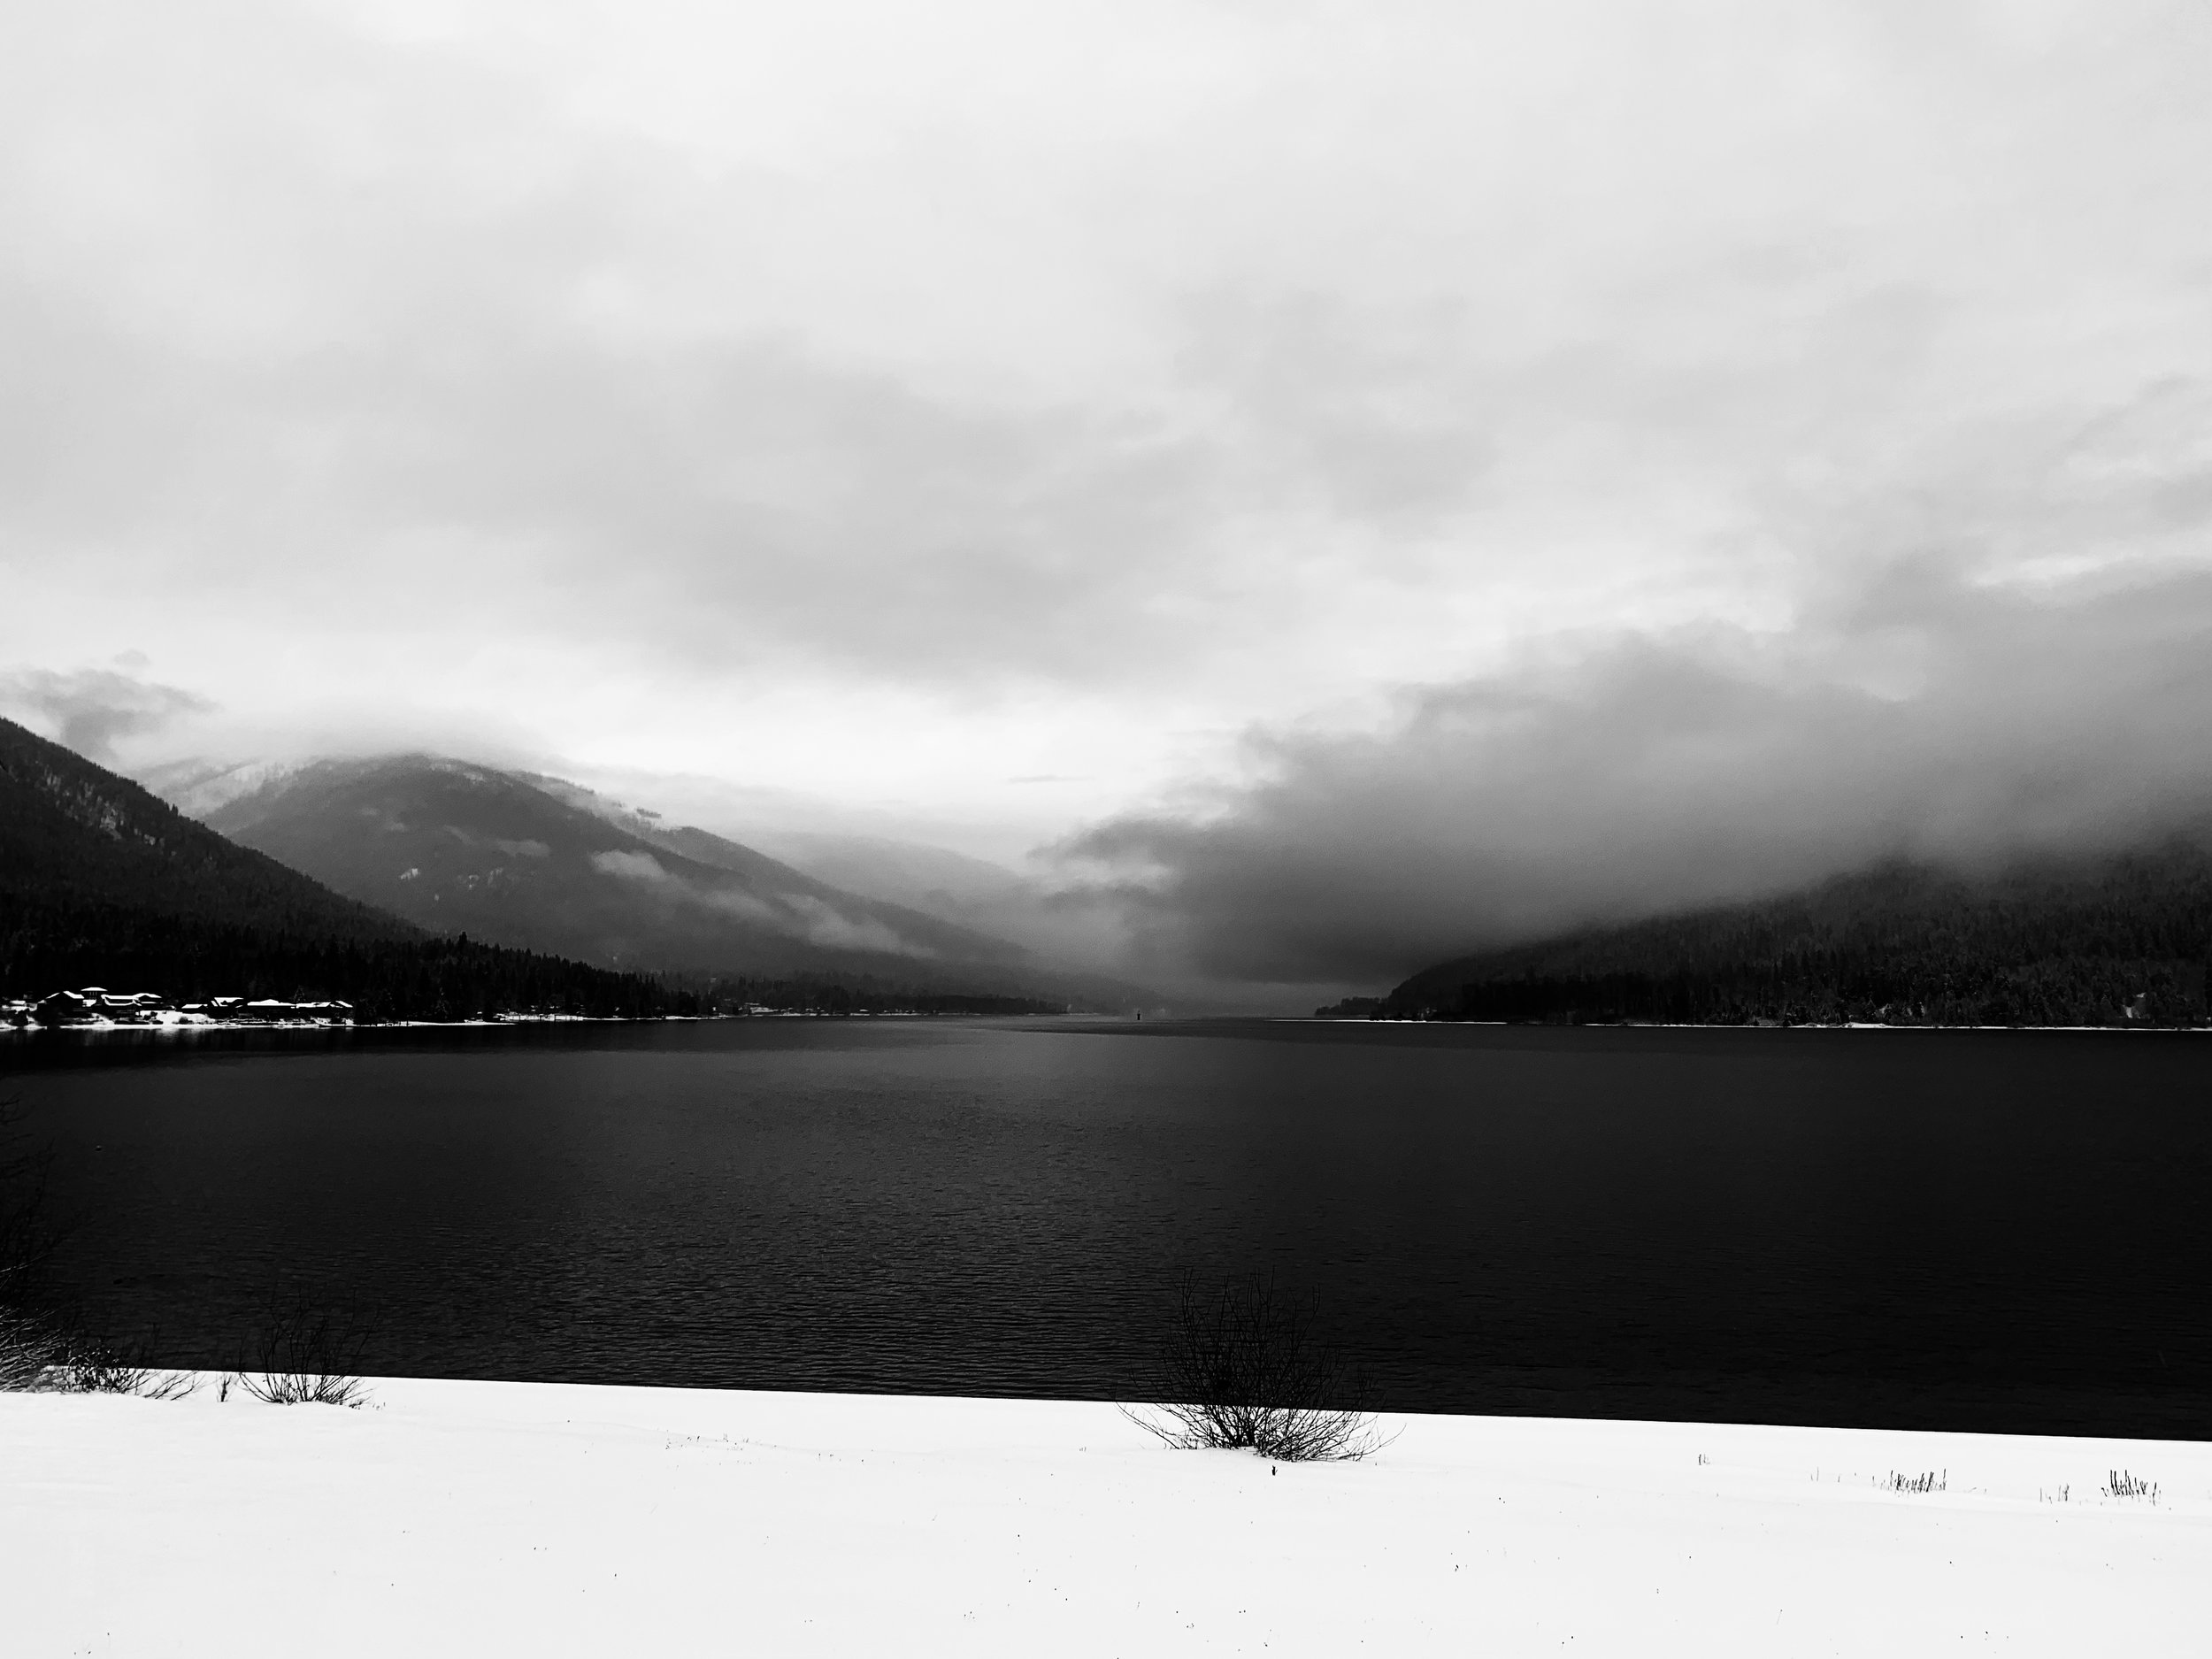 Kootenay Lake, British Columbia, in clouds and snow